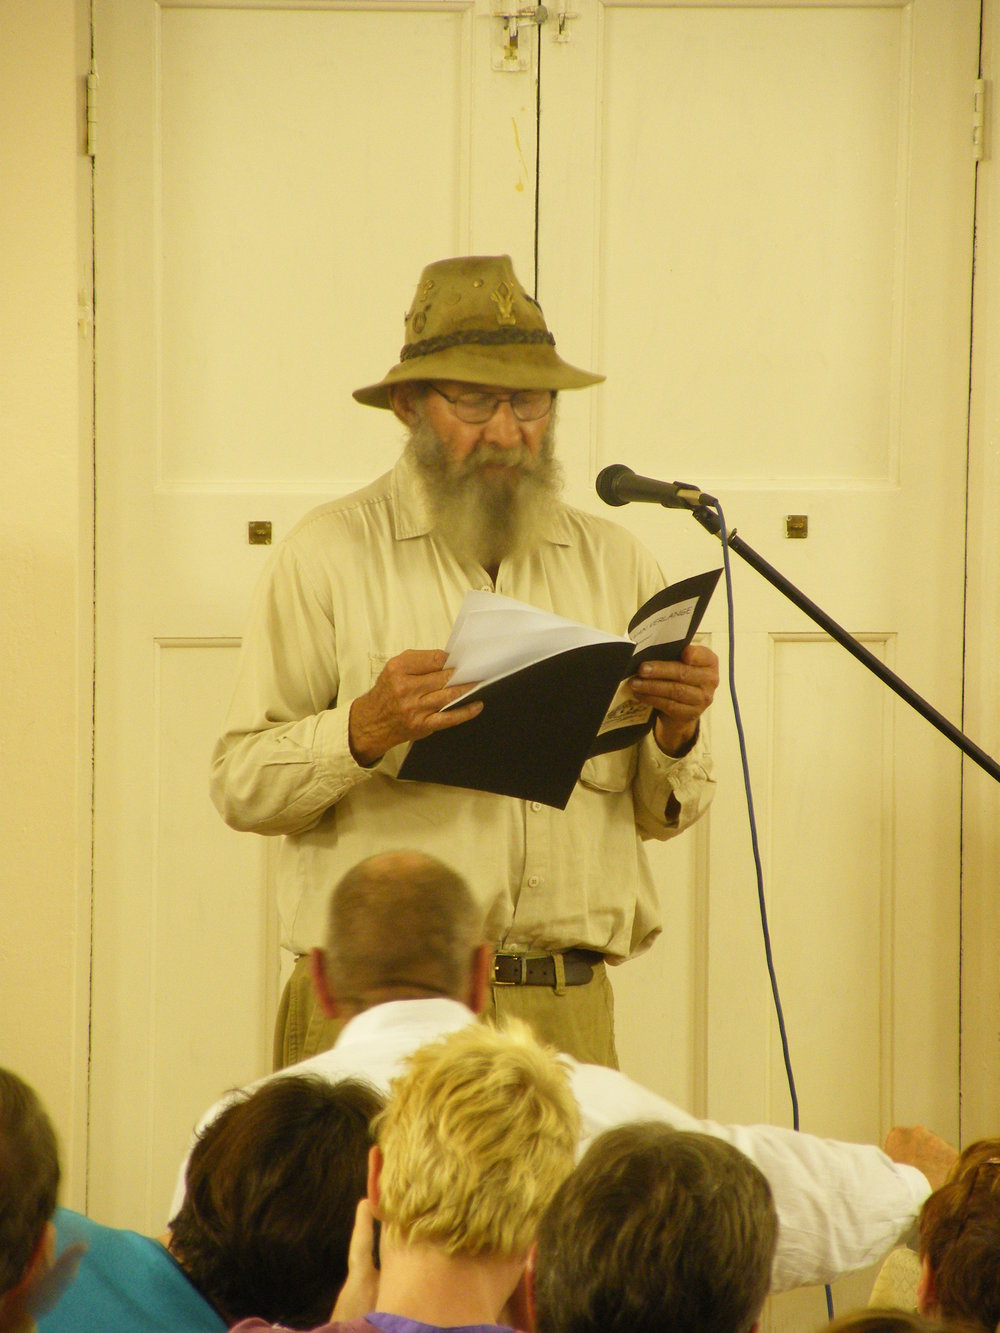 Oom Piet Rympies